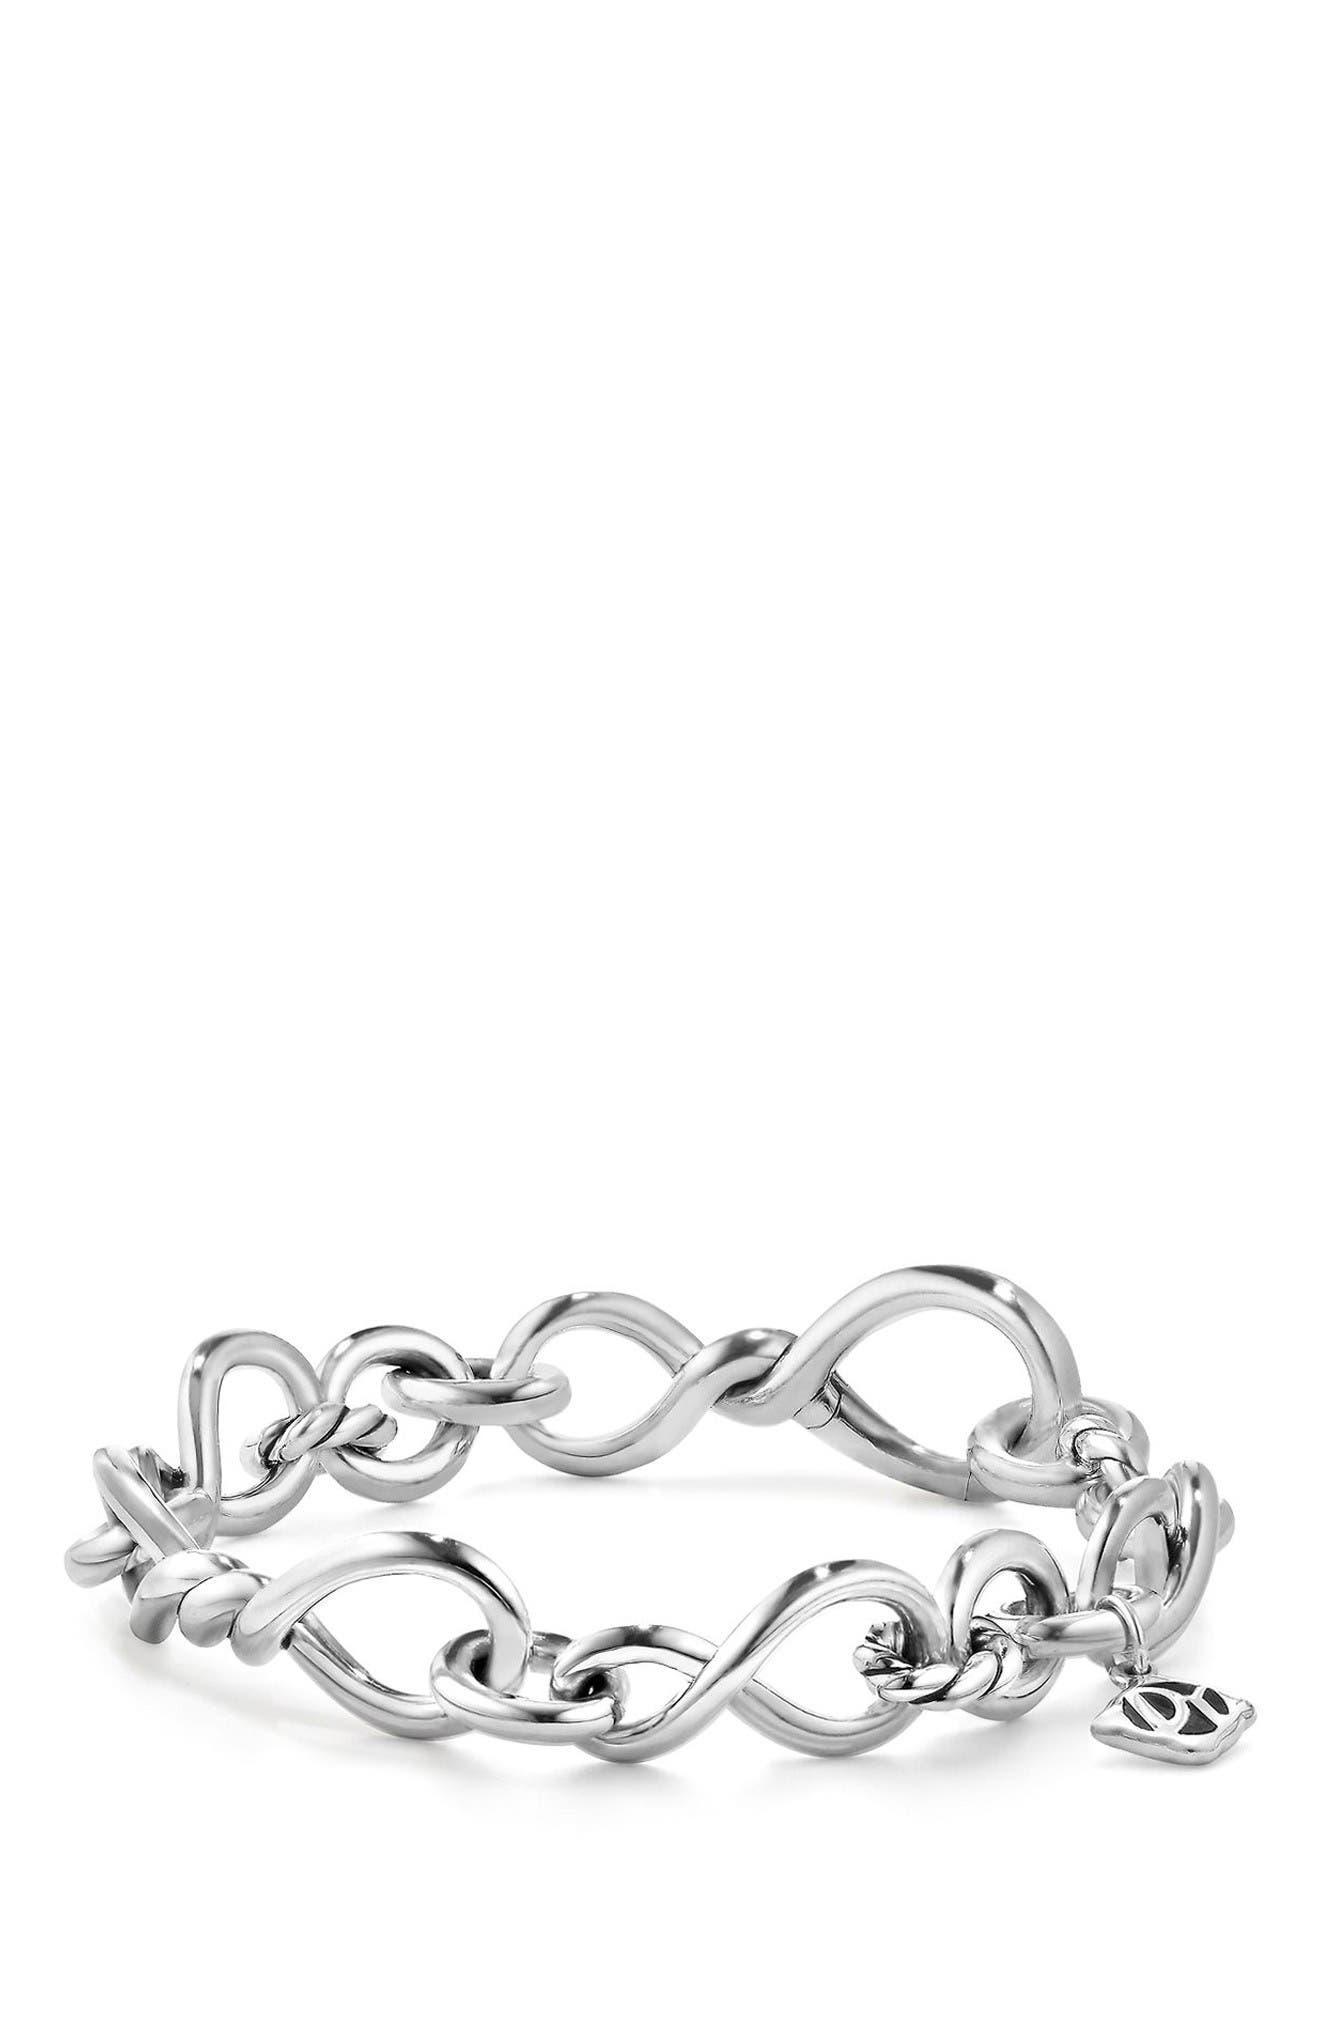 Main Image - David Yurman Continuance Medium Chain Bracelet